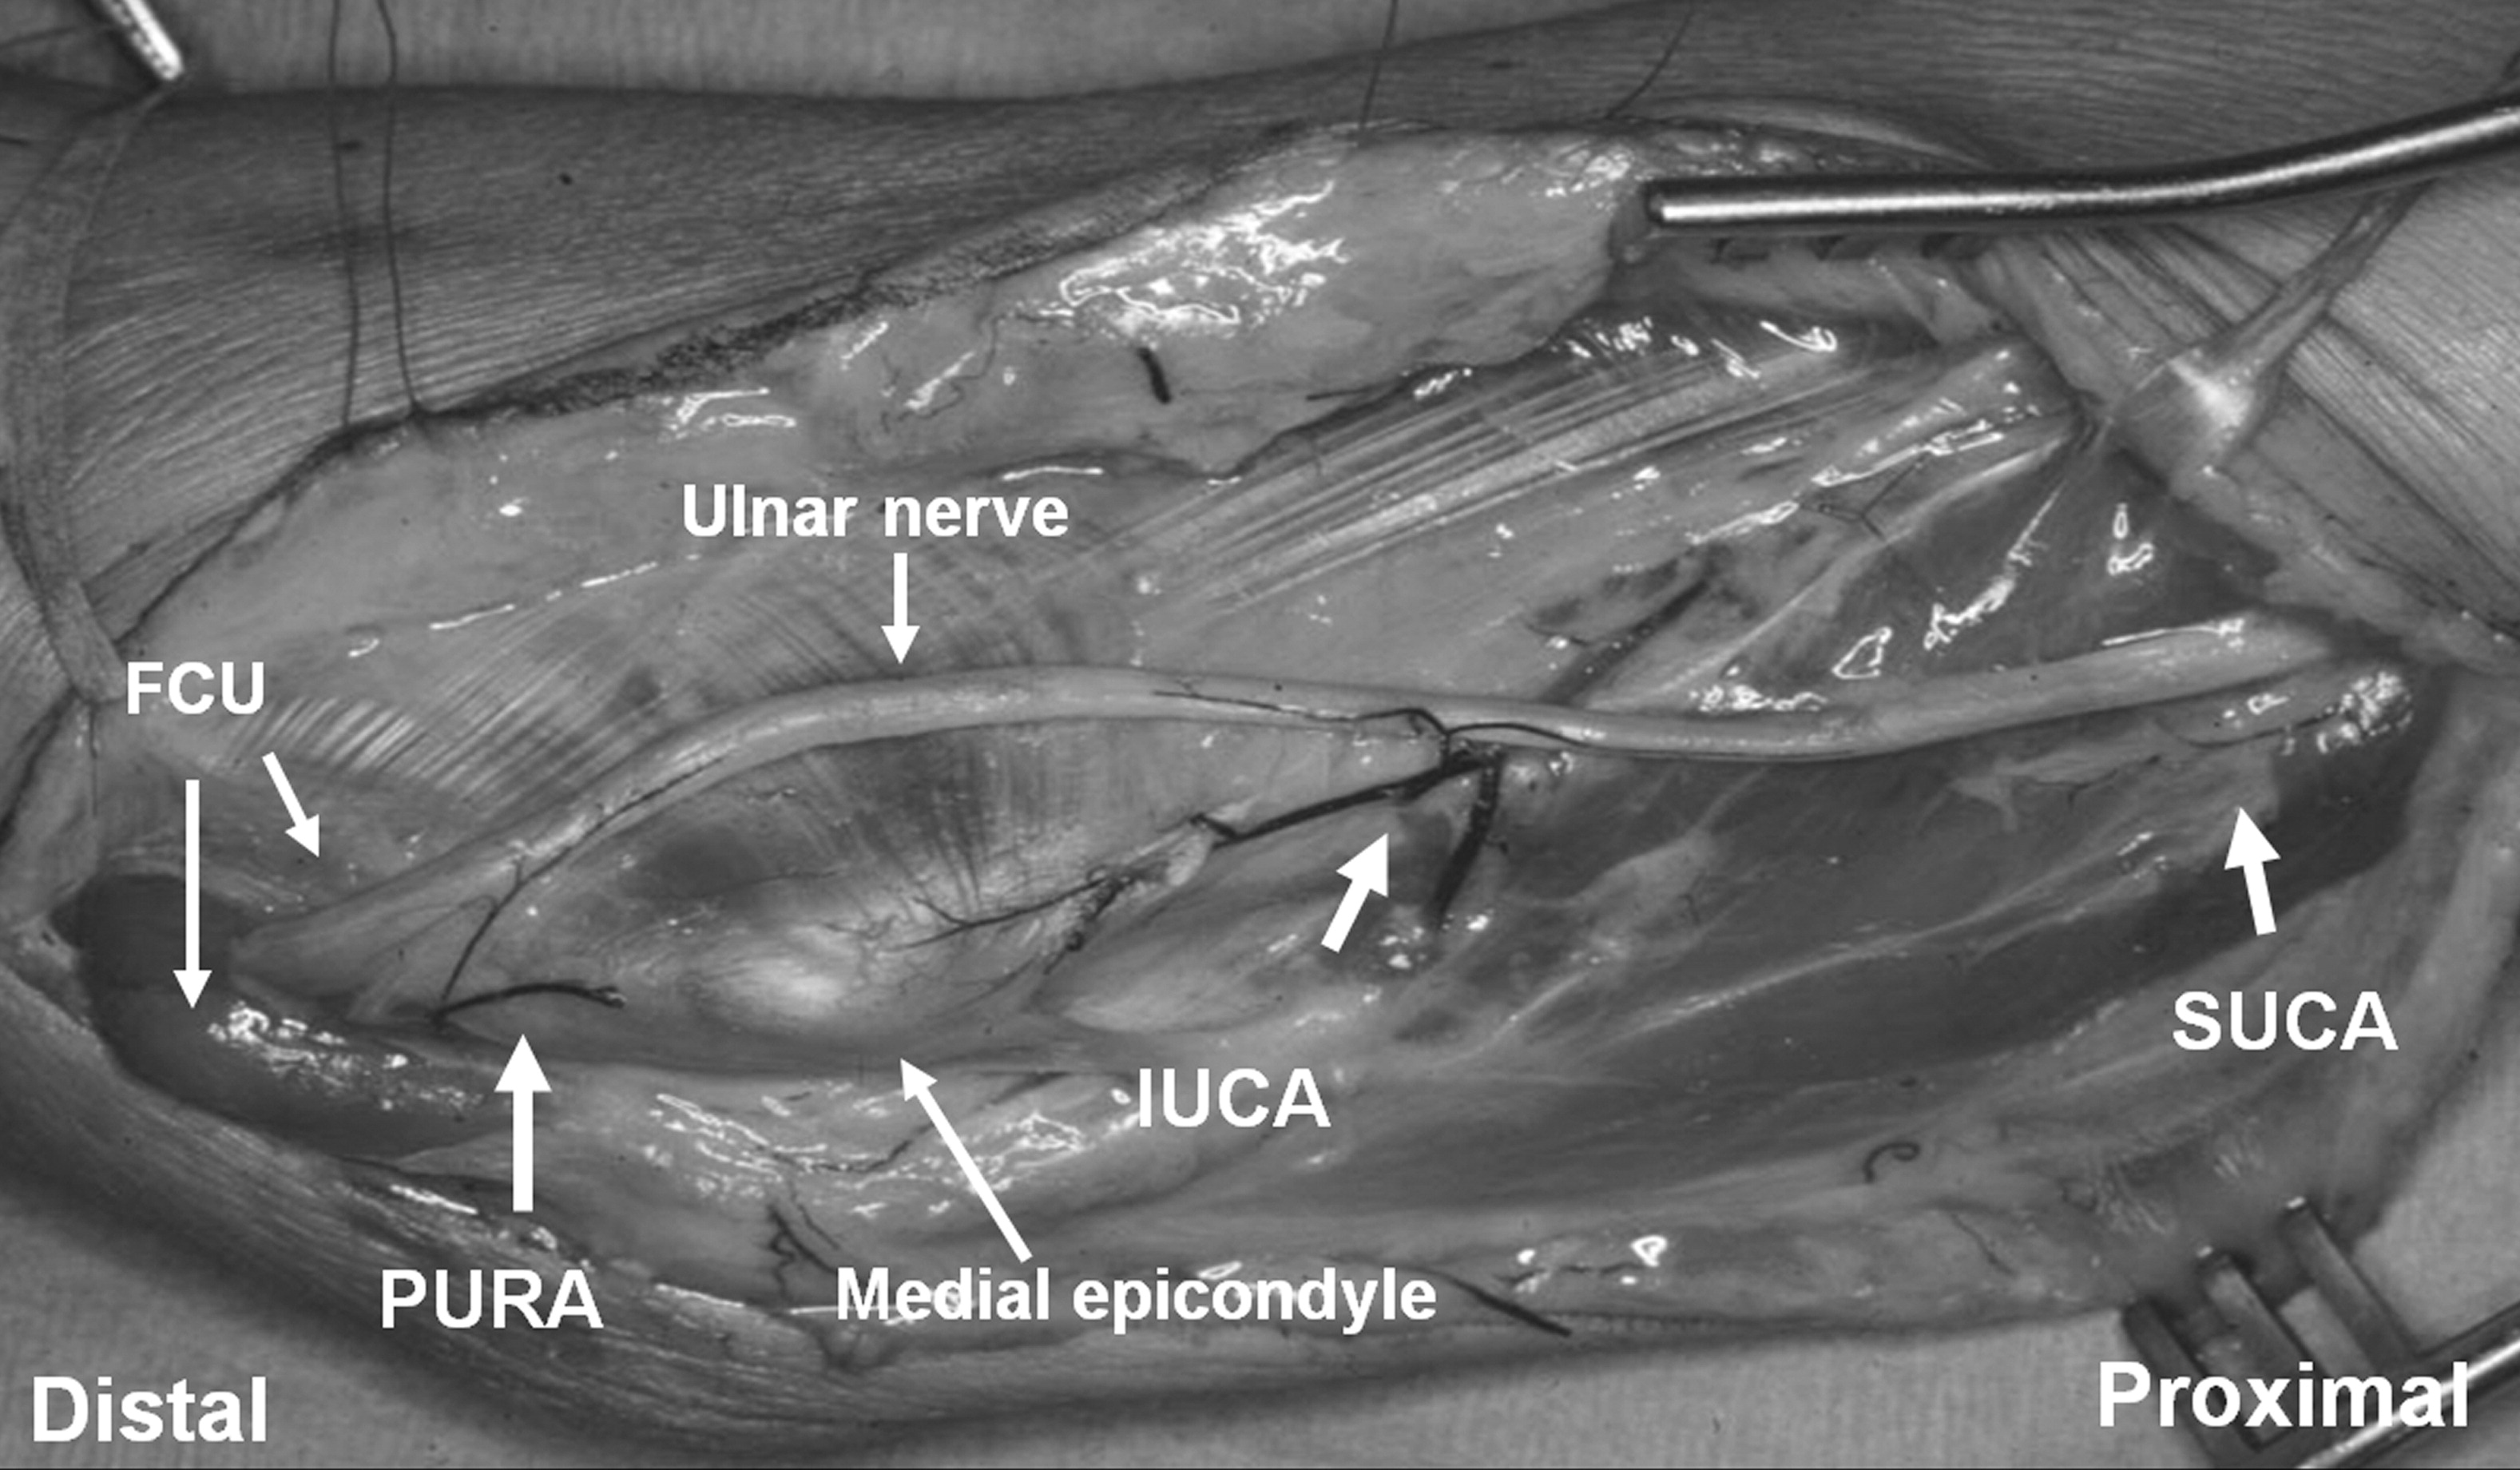 ulnar nerve diagram bone cross section the effect of vascular pedicle preservation on blood flow